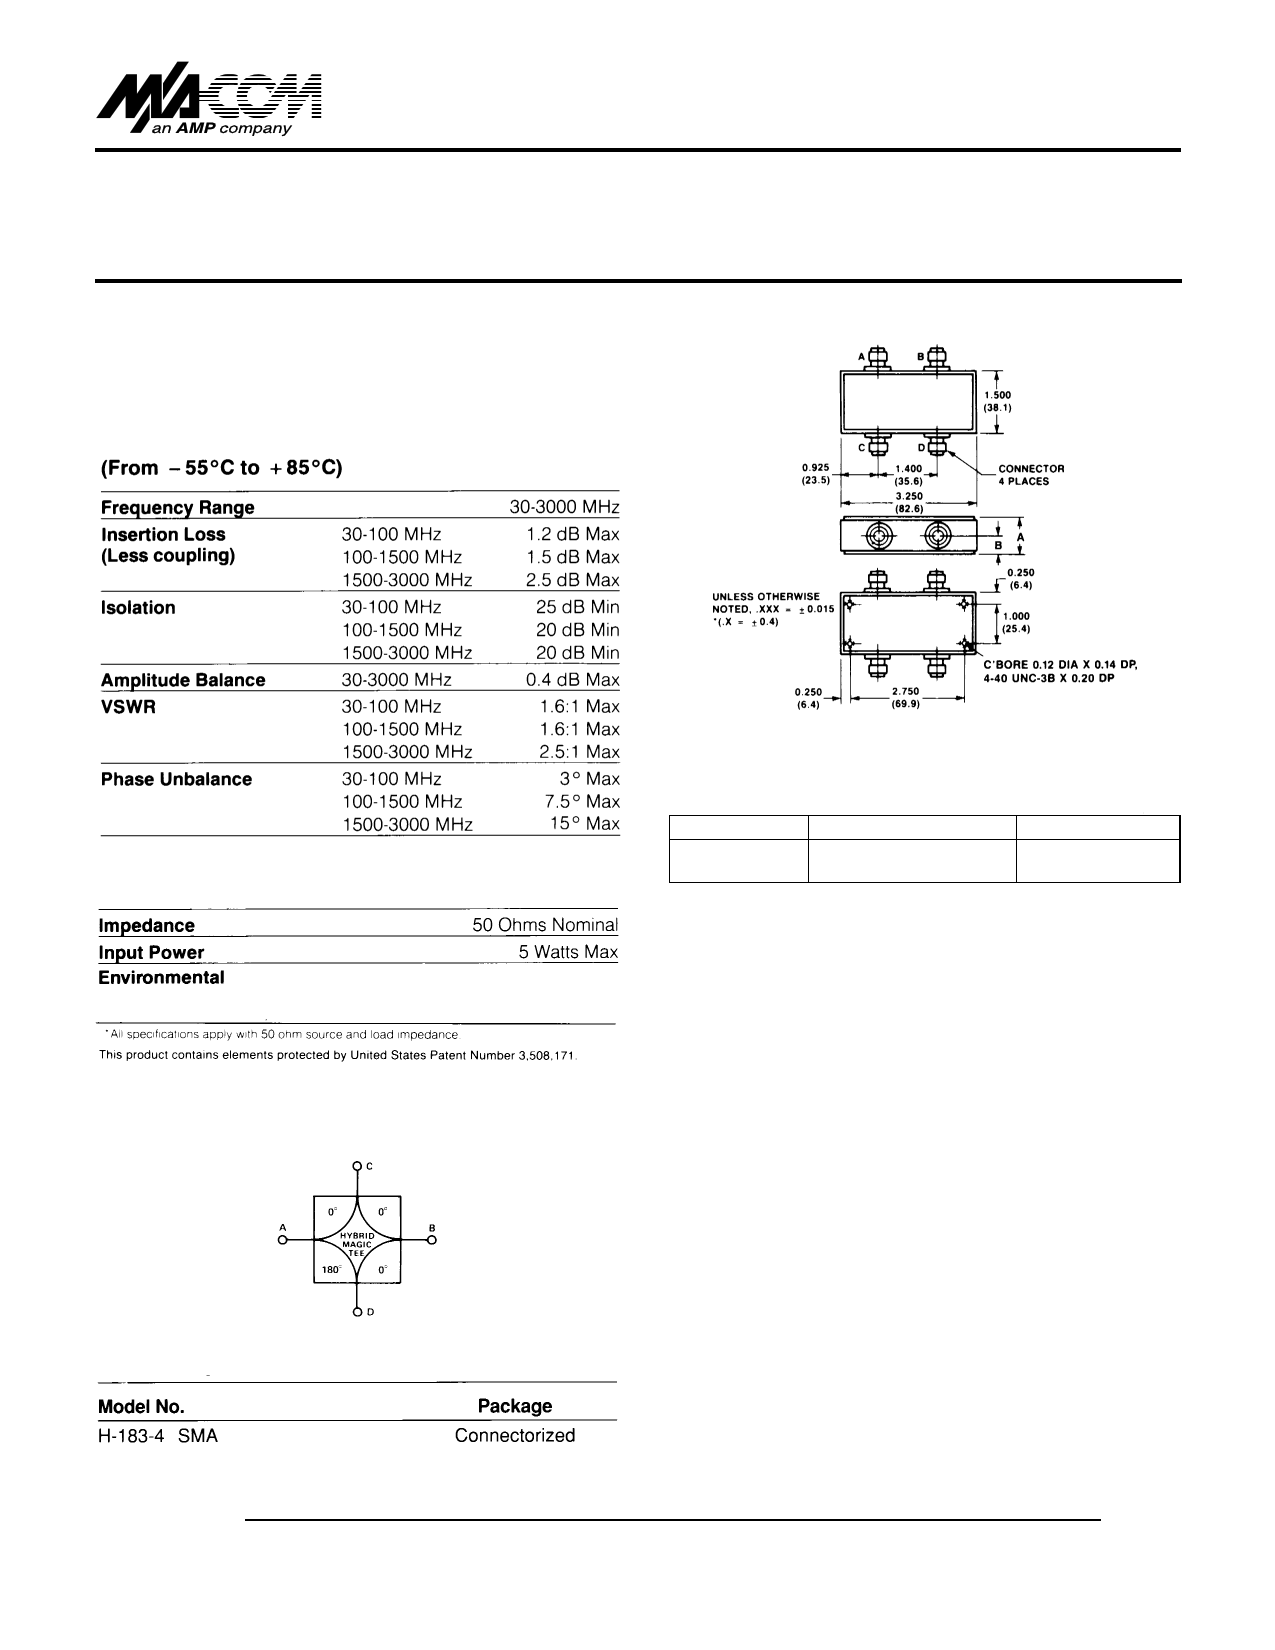 H-183-4 datasheet